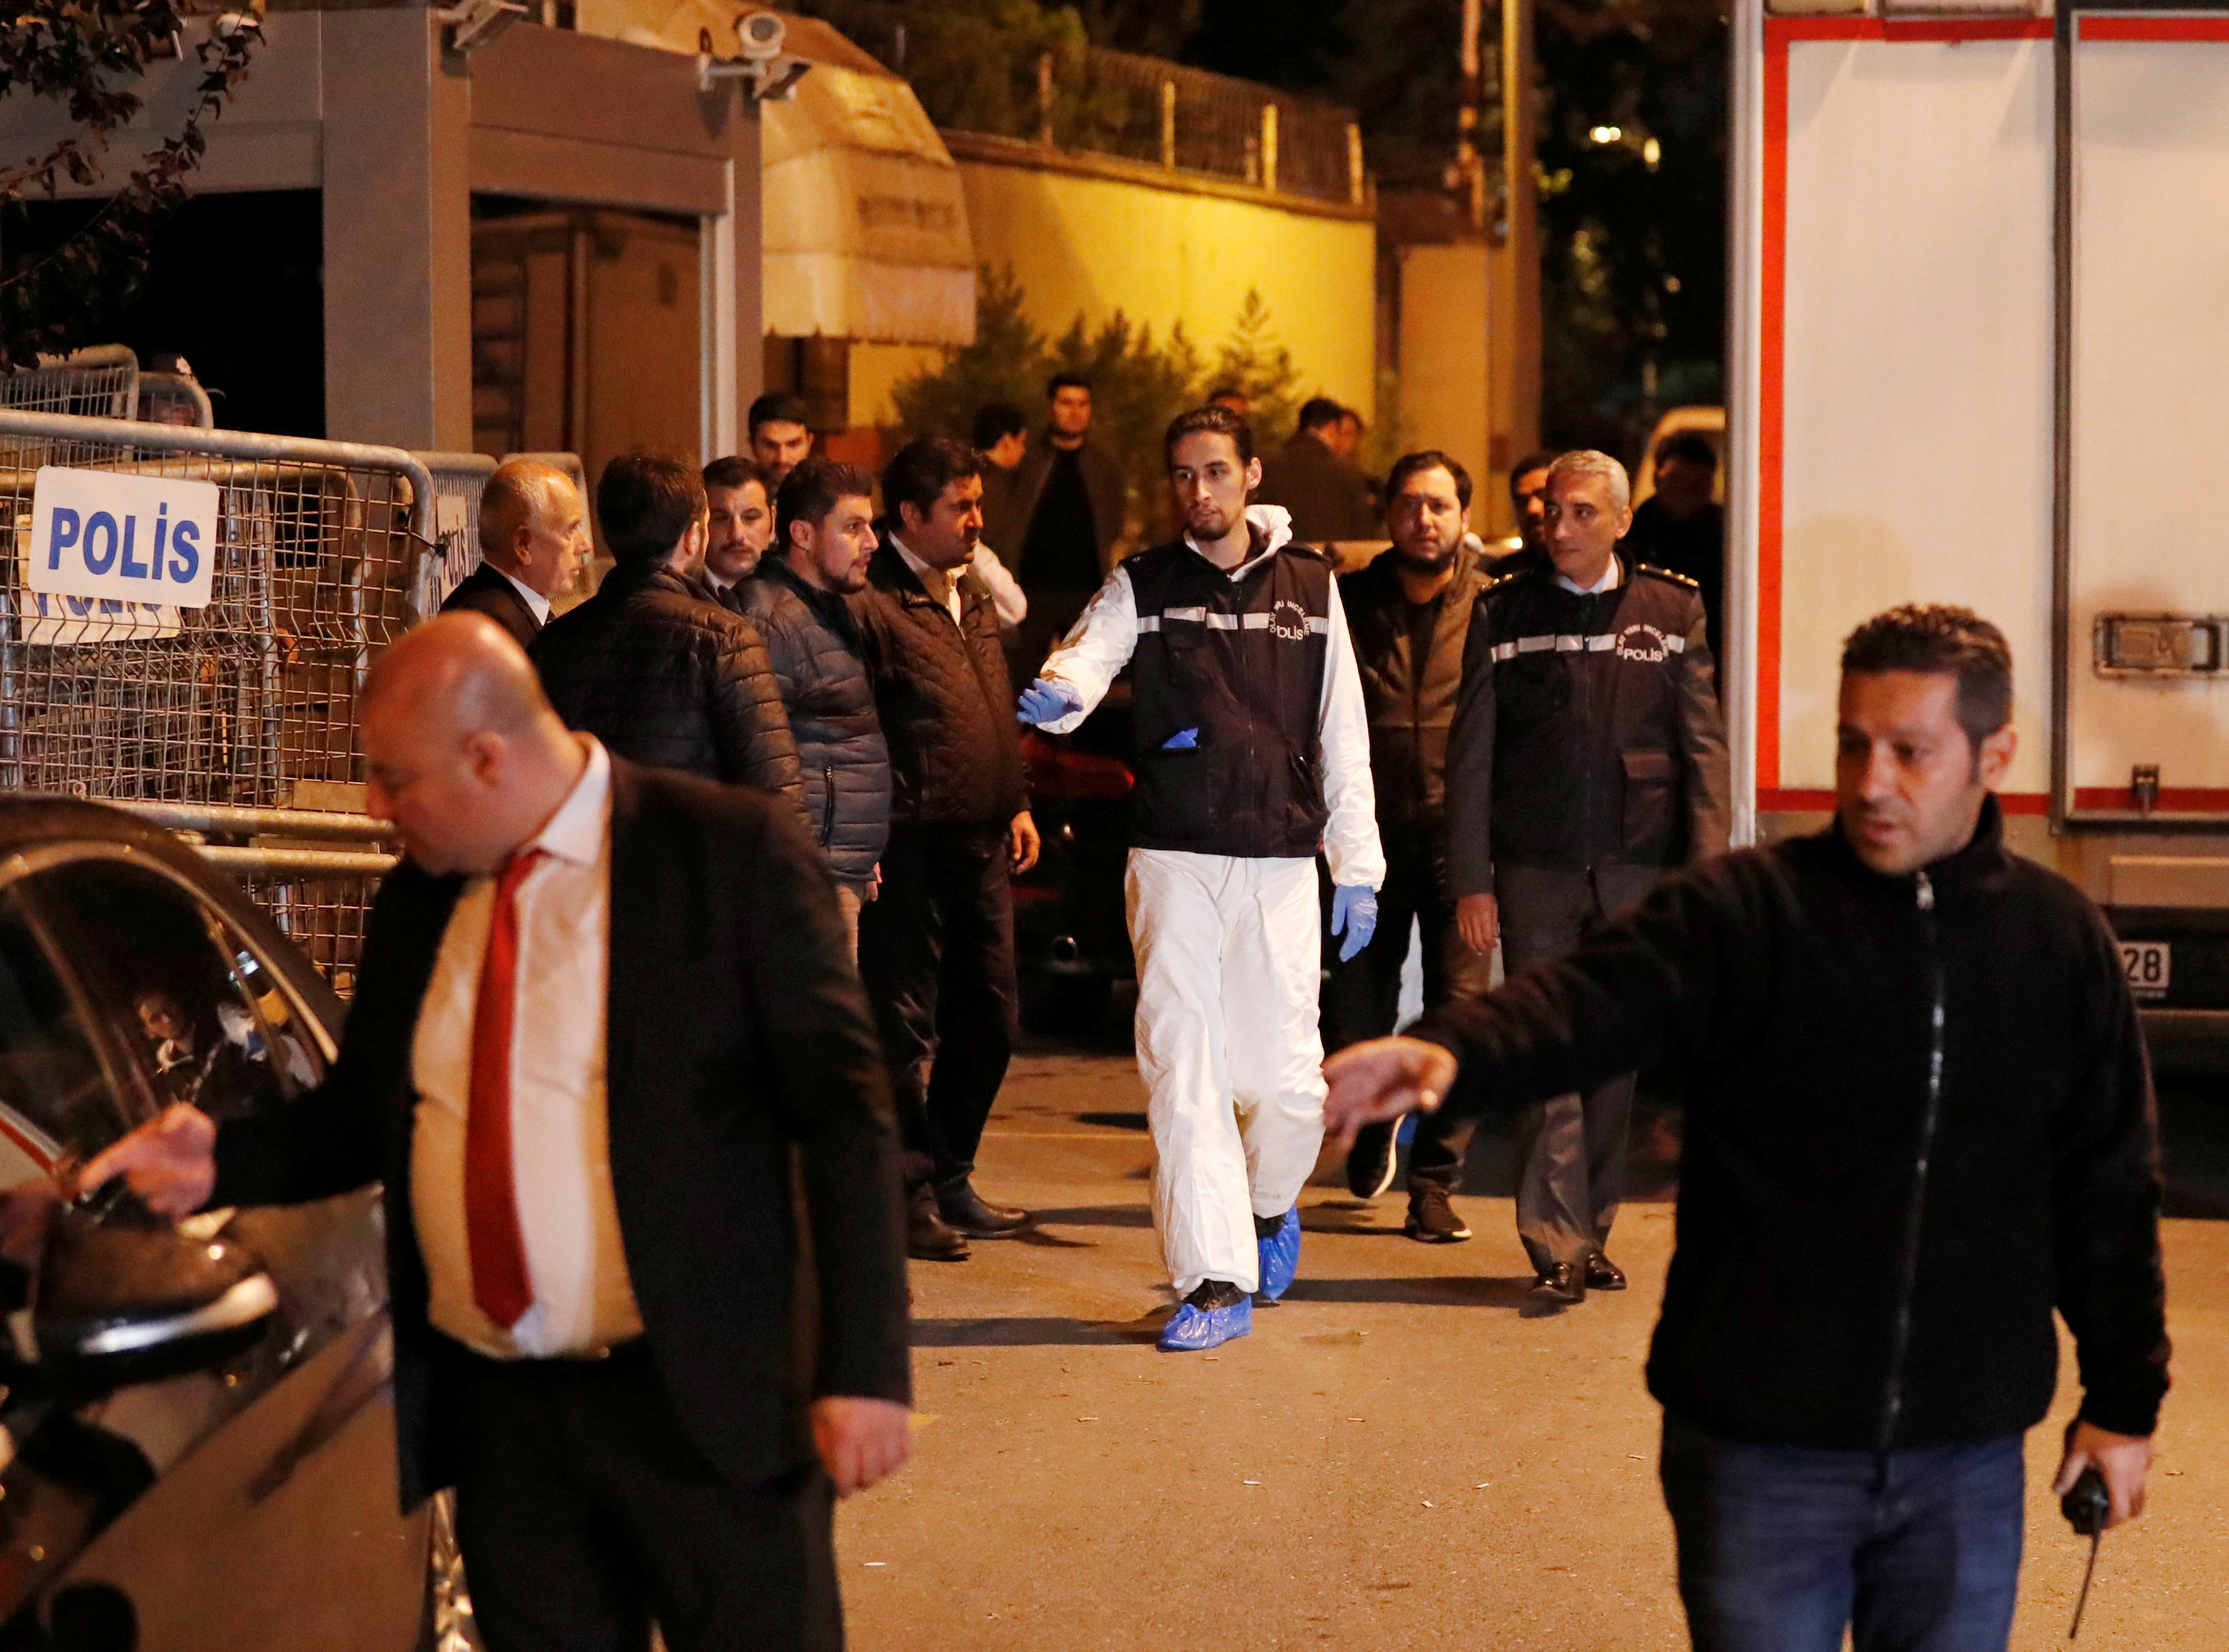 Expertos forenses se retiran de la sede diplomática (Reuters)